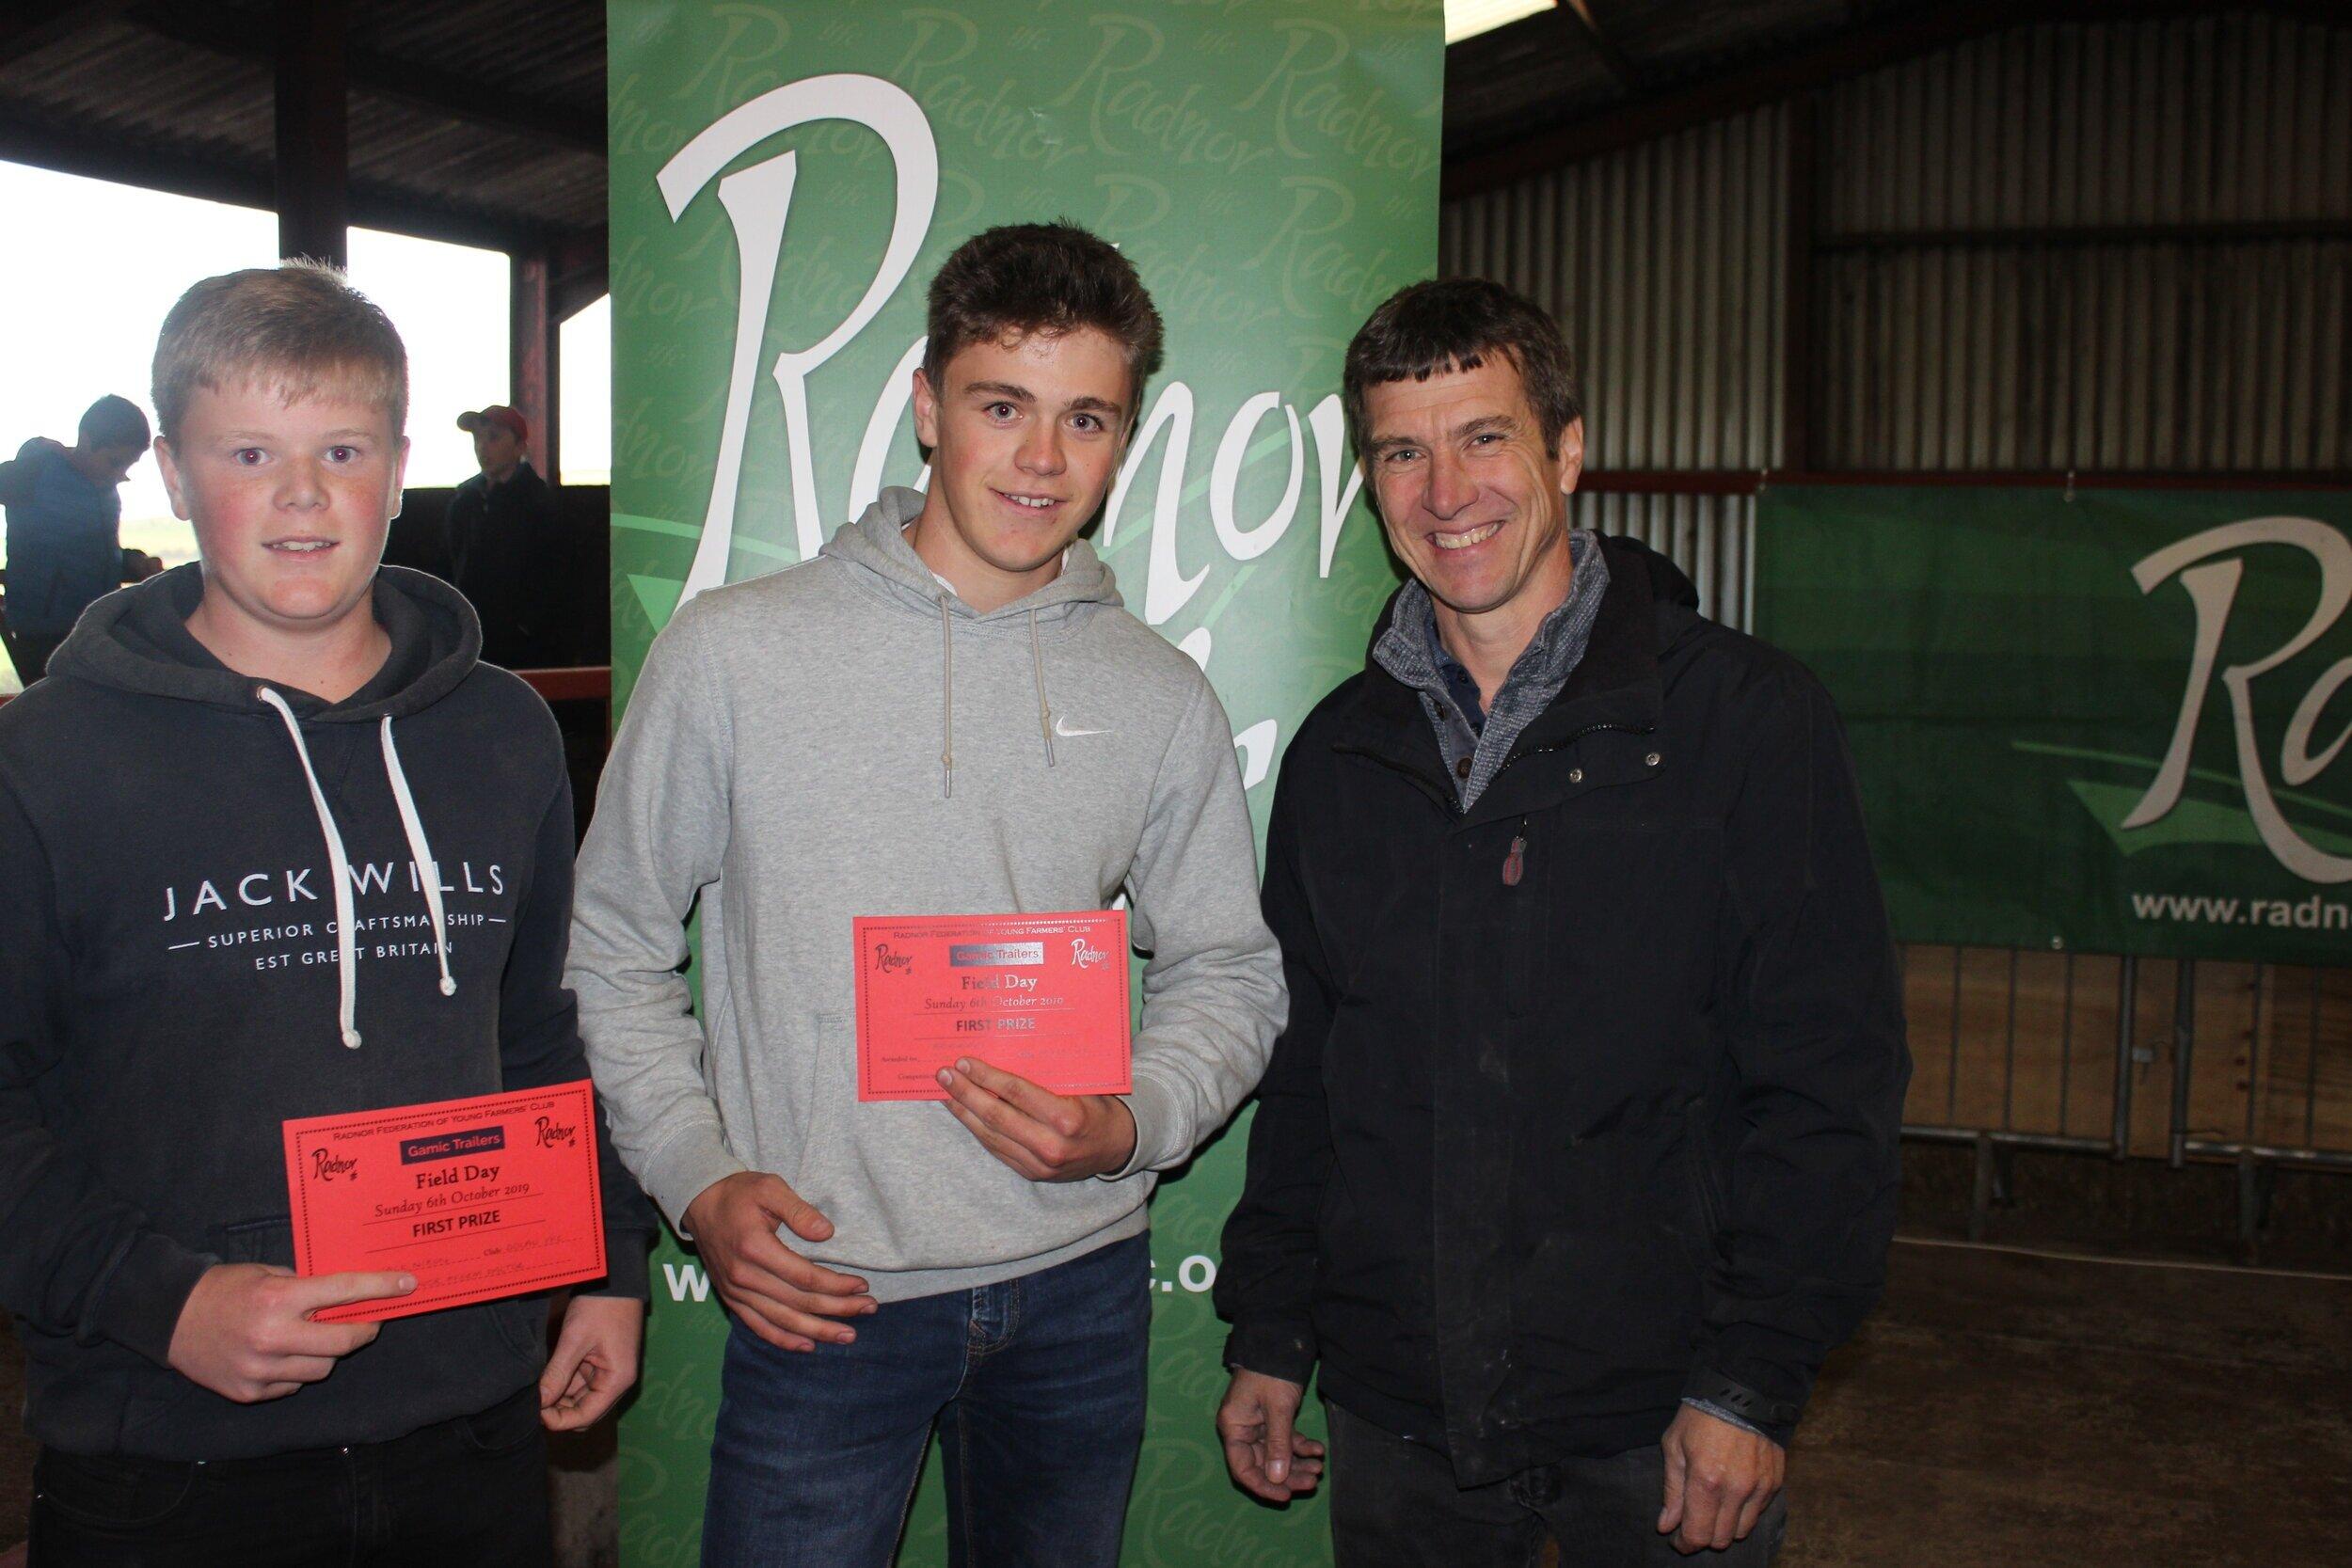 Tom & Jack Nixon, Dolau YFC - 1st place in the Junior Fferm Factor with Mark Watson